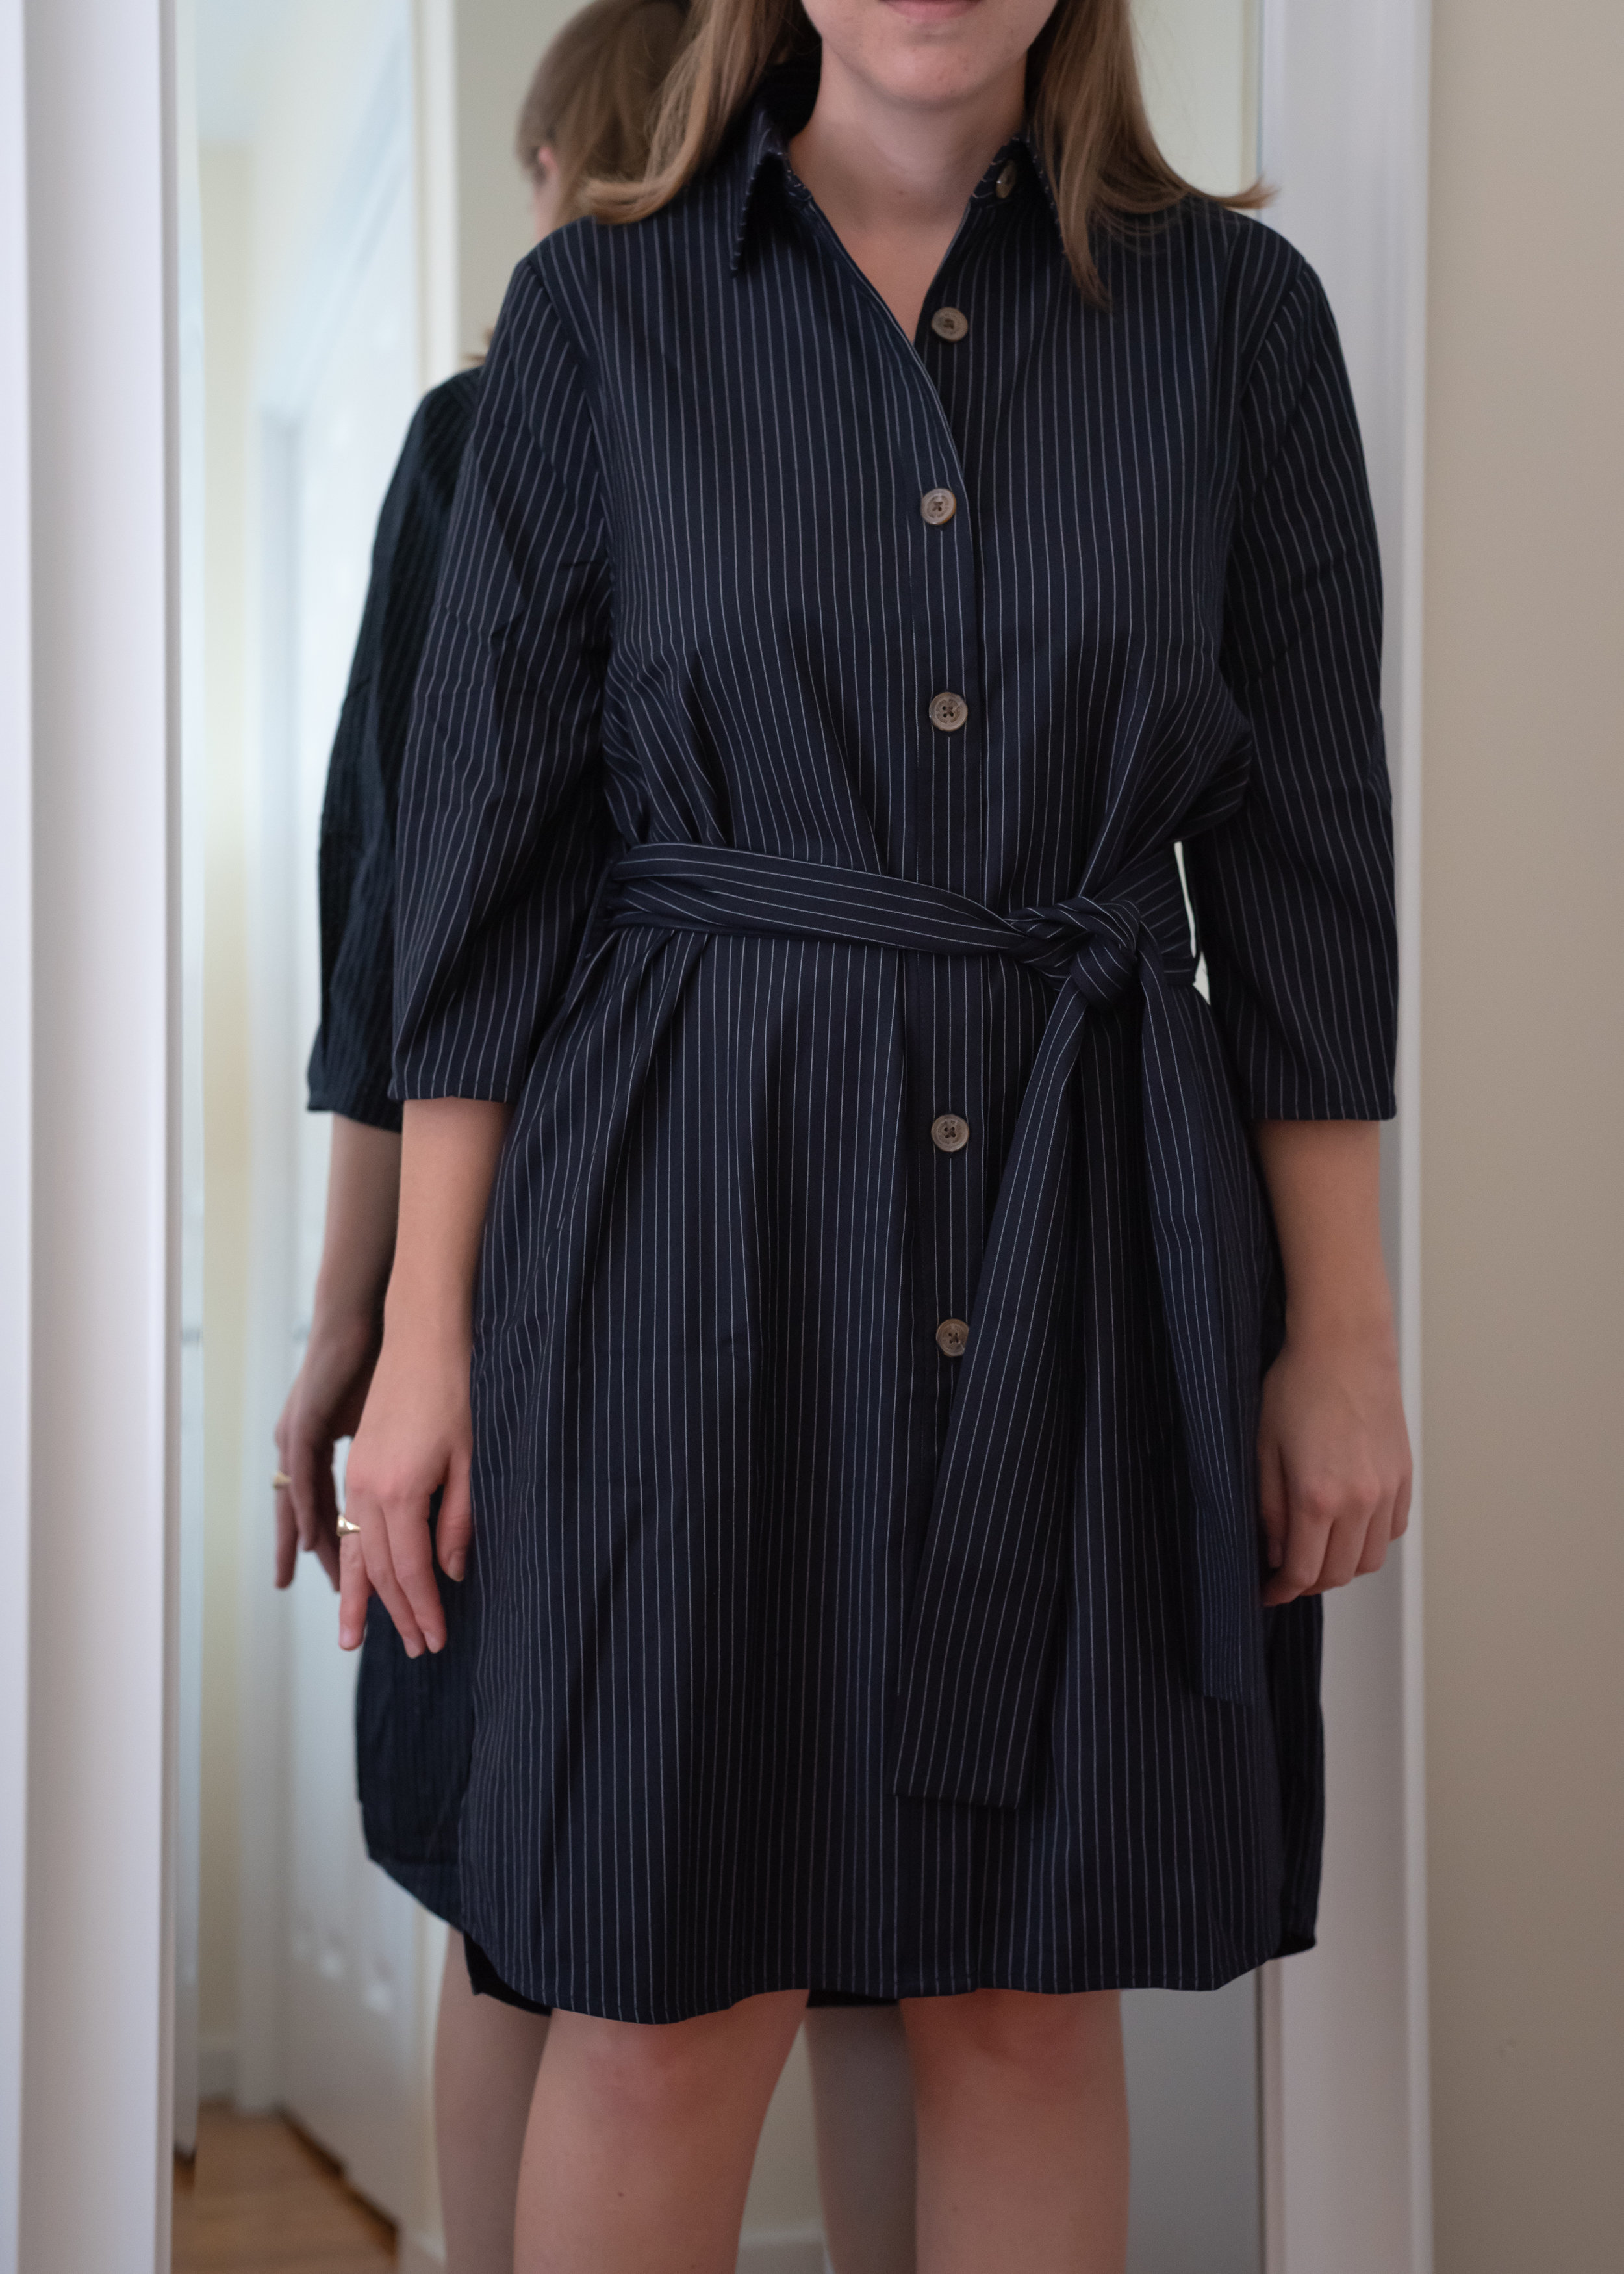 Petite Studio Rococo Dress - Size Petite M - FRONT